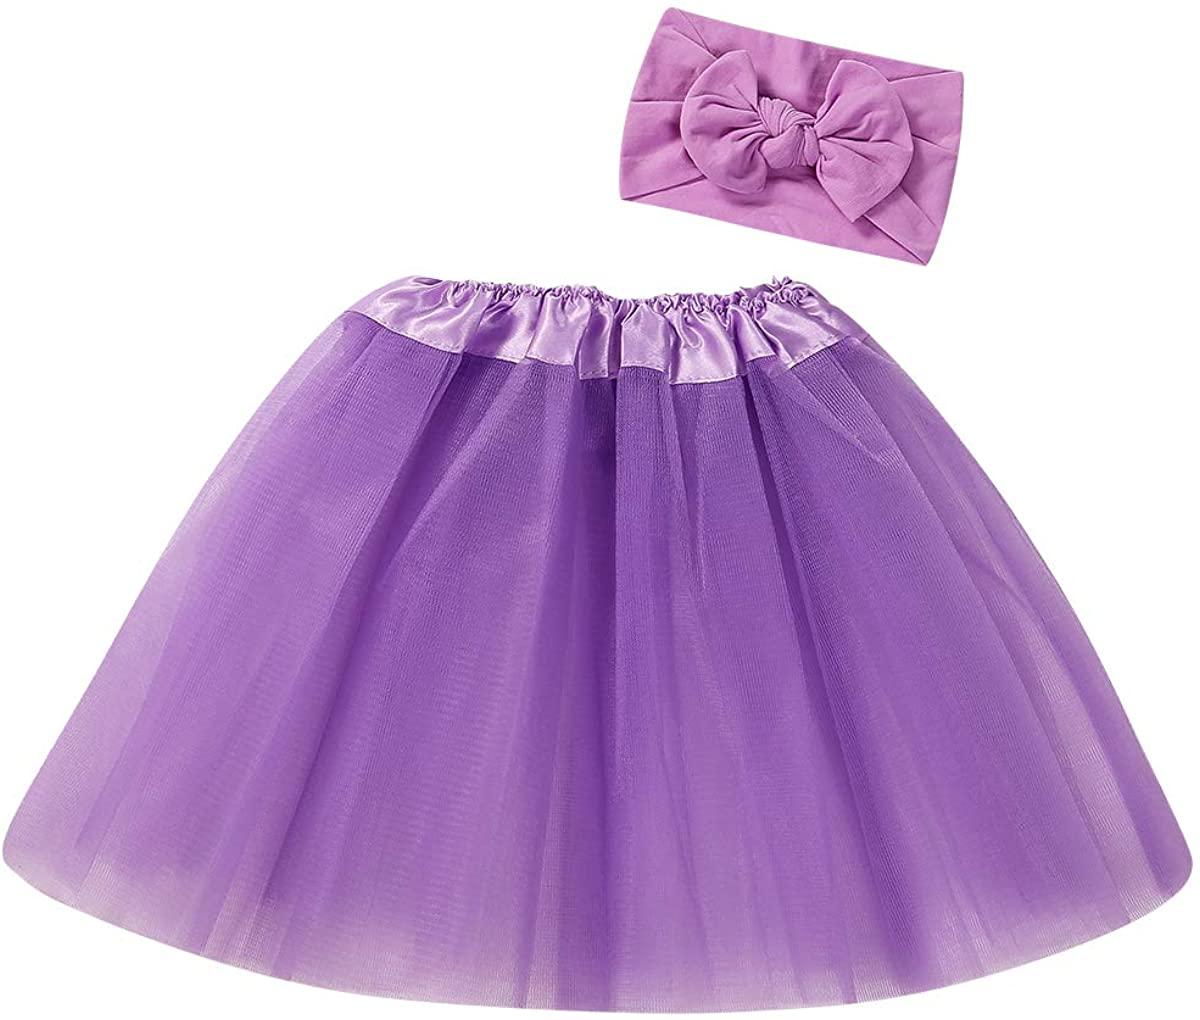 Newborn Baby Girl Tutu Skirt Headband Photo Prop Cute Infant Princess Costume Baby Clothes Outfit Set